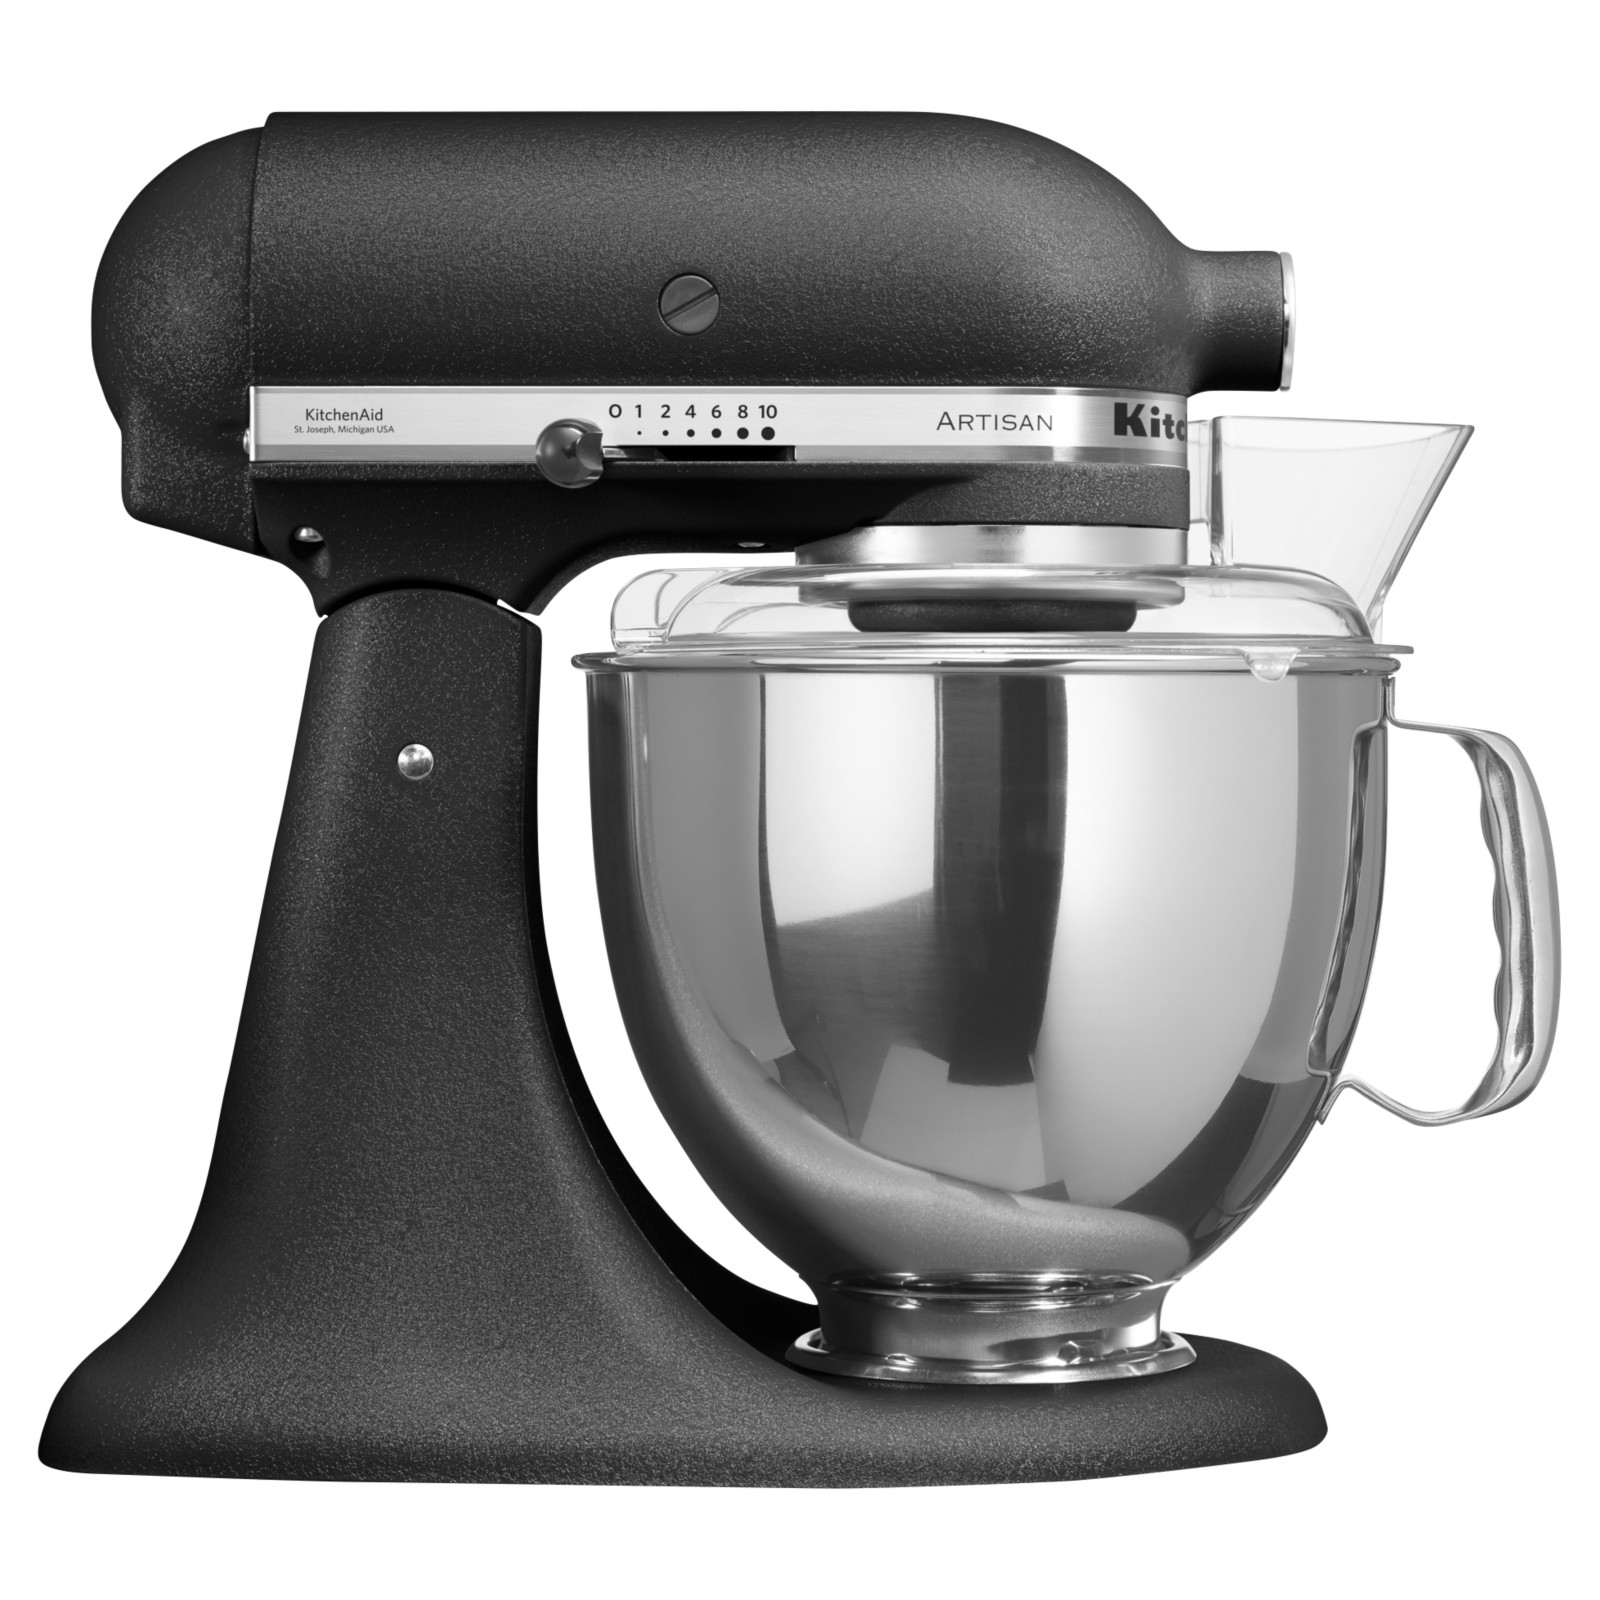 KitchenAid Artisan 4.8L Stand Mixer Cast Iron